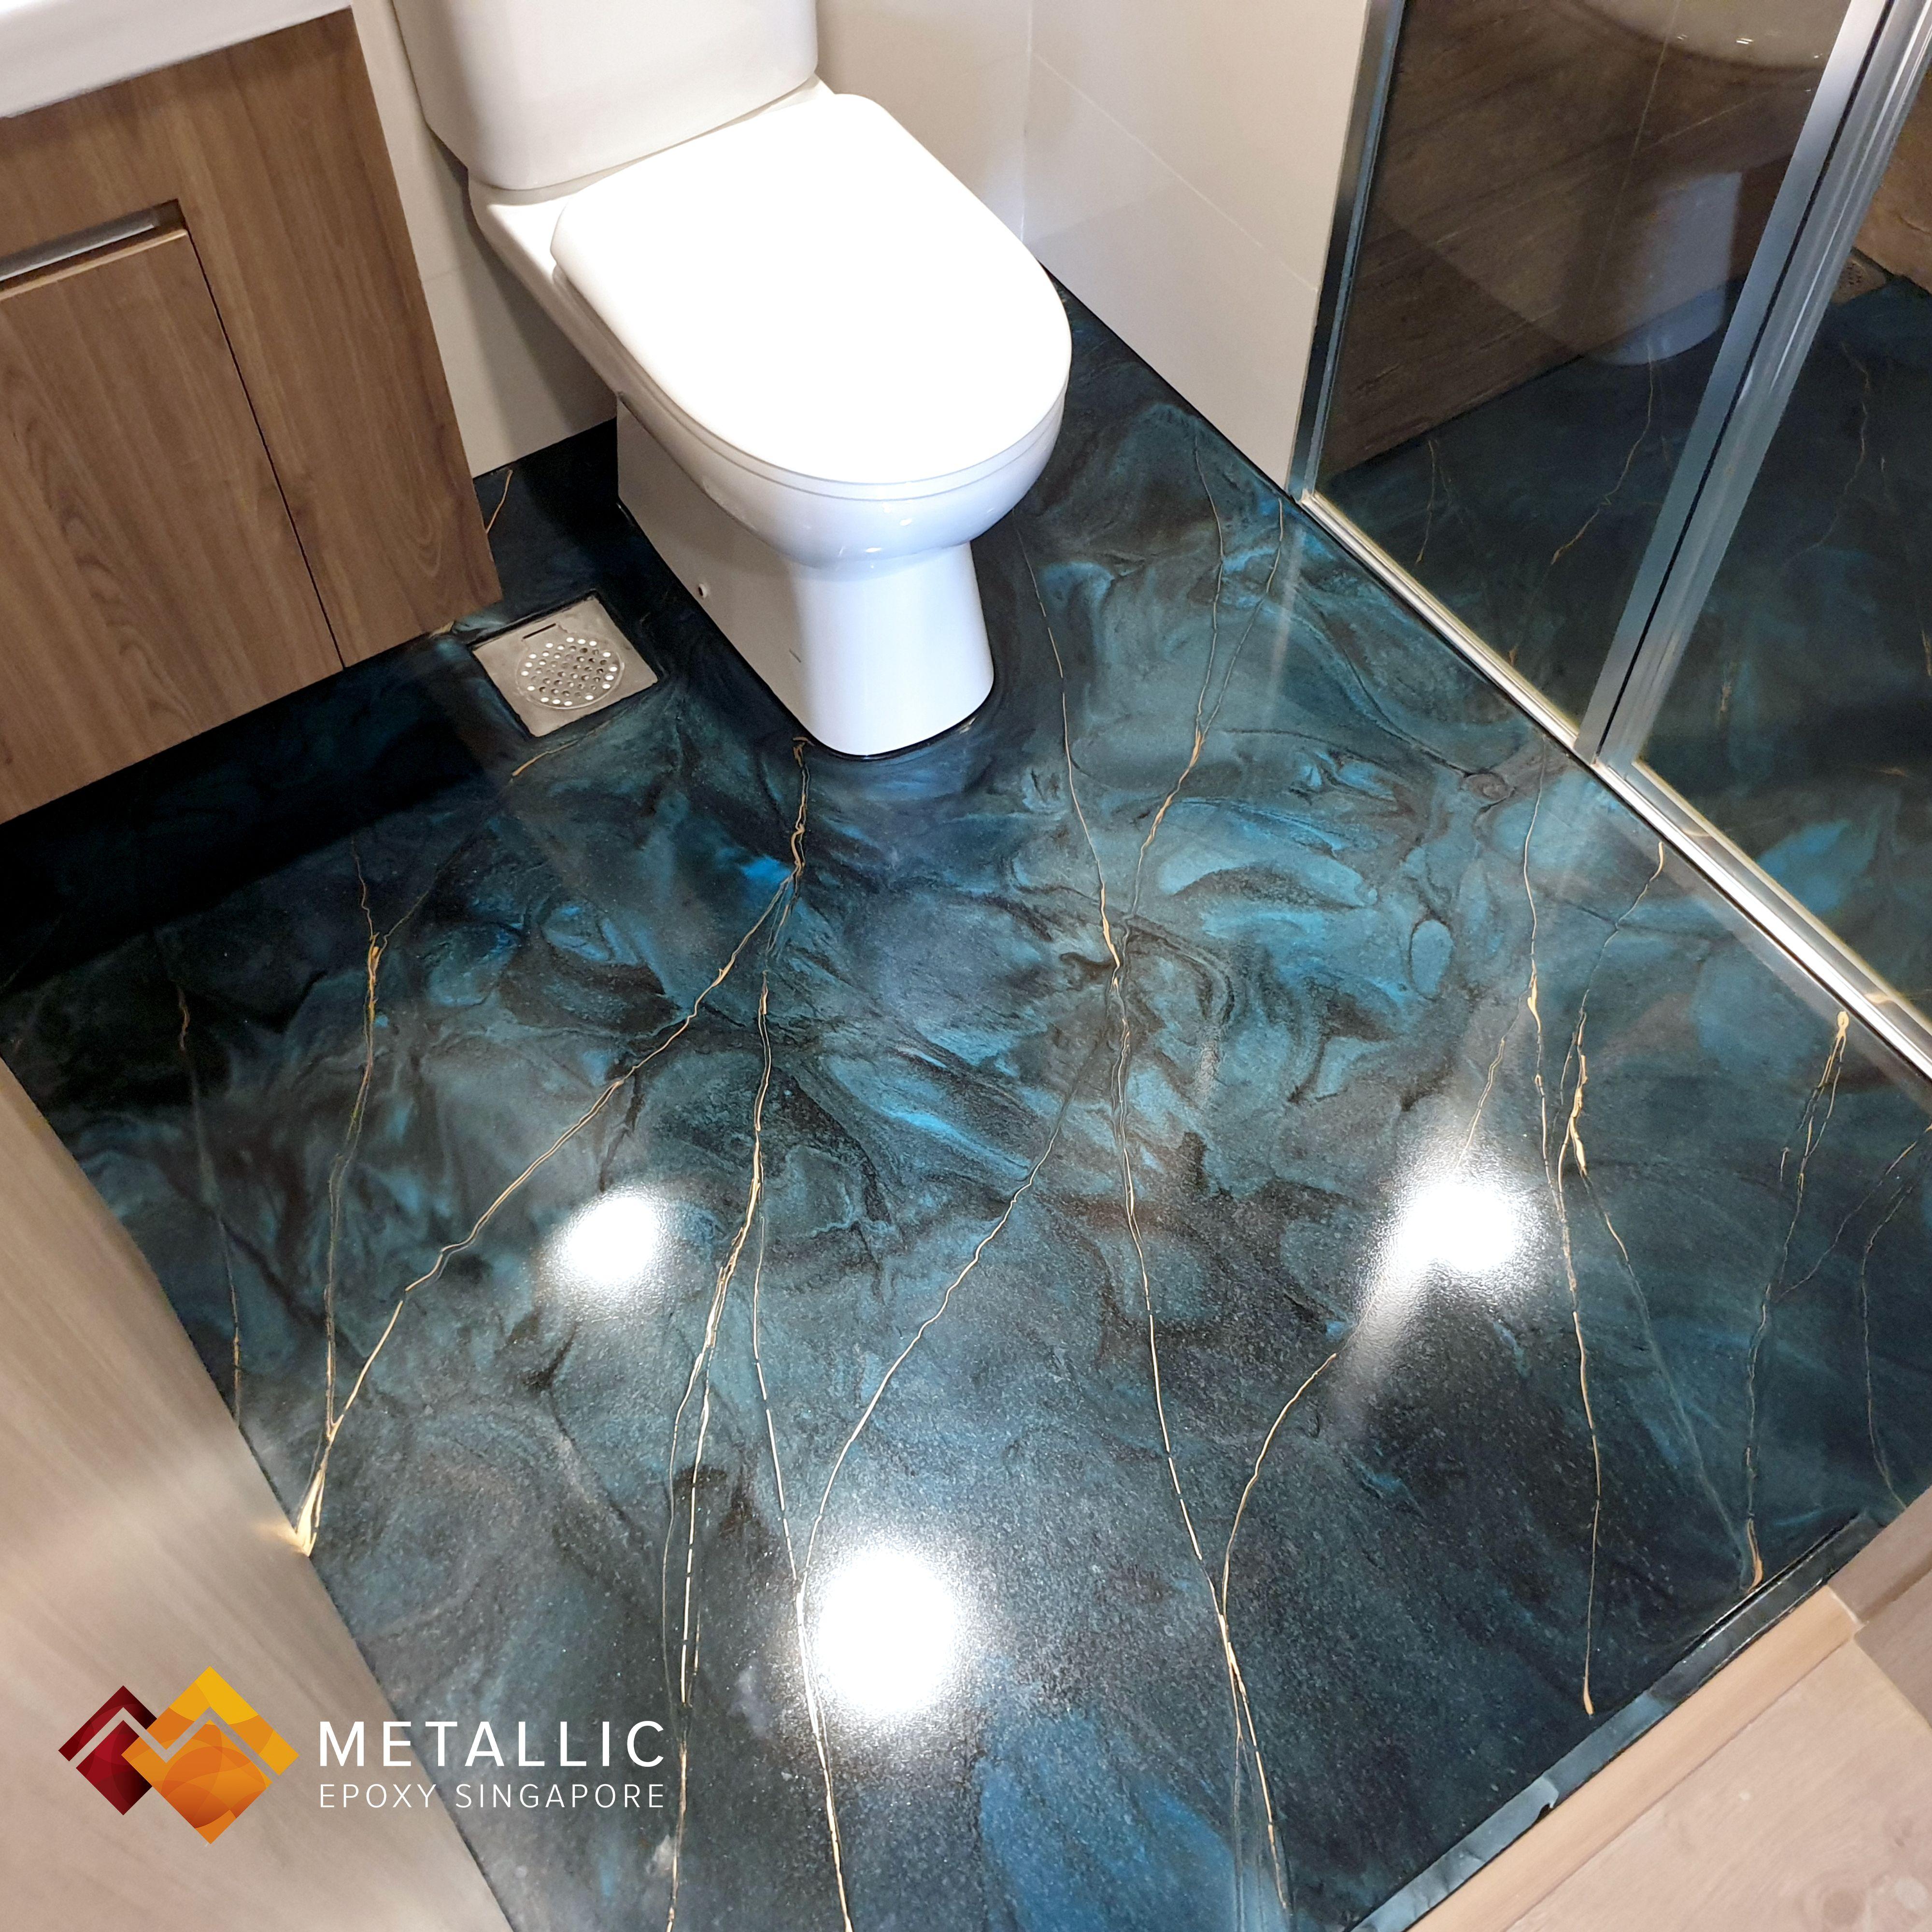 Metallic Epoxy Singapore Blue Galaxy With Gold Veins Bathroom Floor Bathroom Flooring Flooring Epoxy Floor